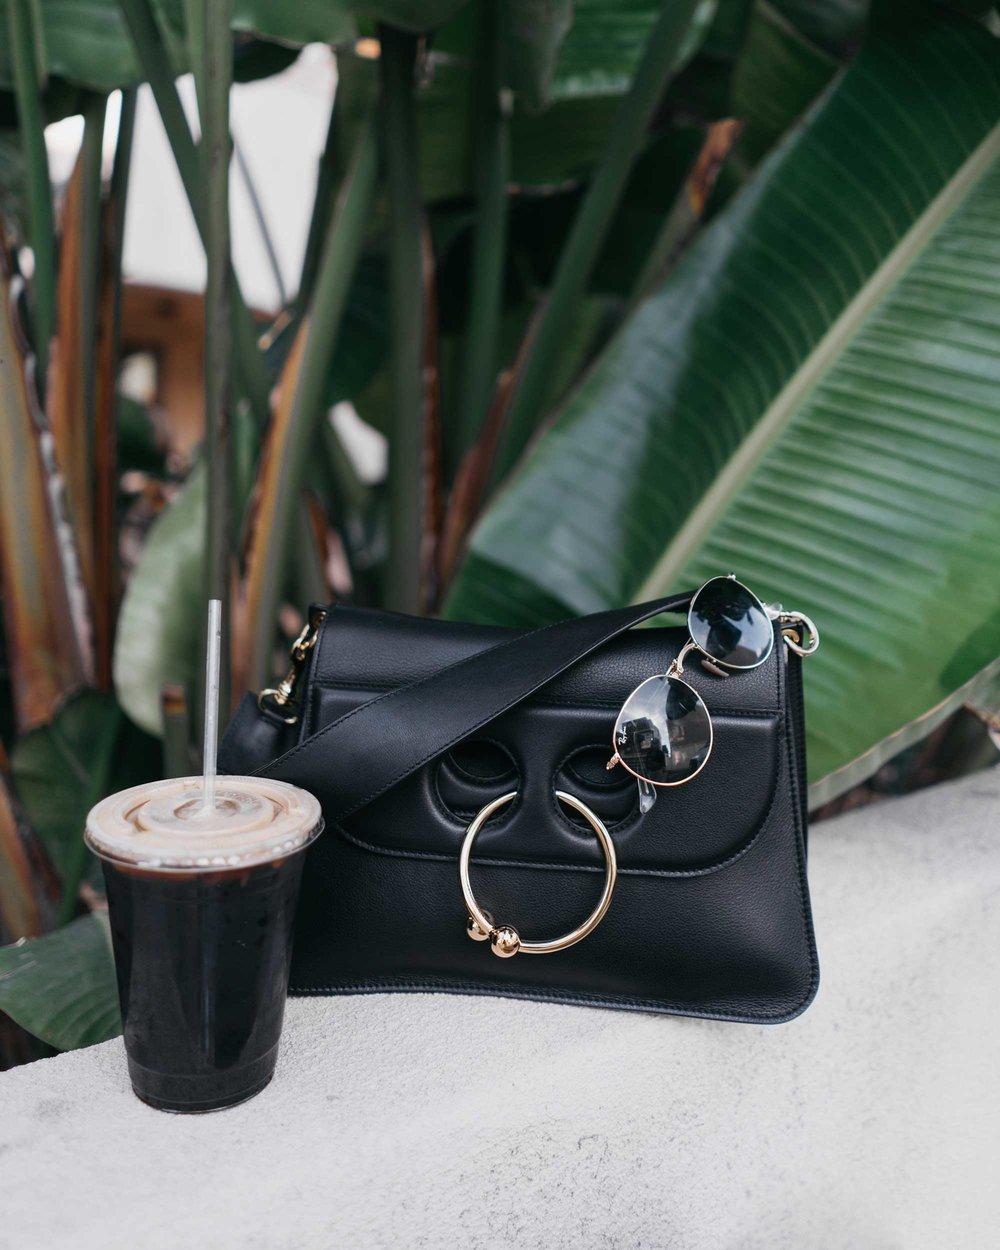 JW-Anderson-Pierce-Medium-Leather-Shoulder-Bag1.jpg